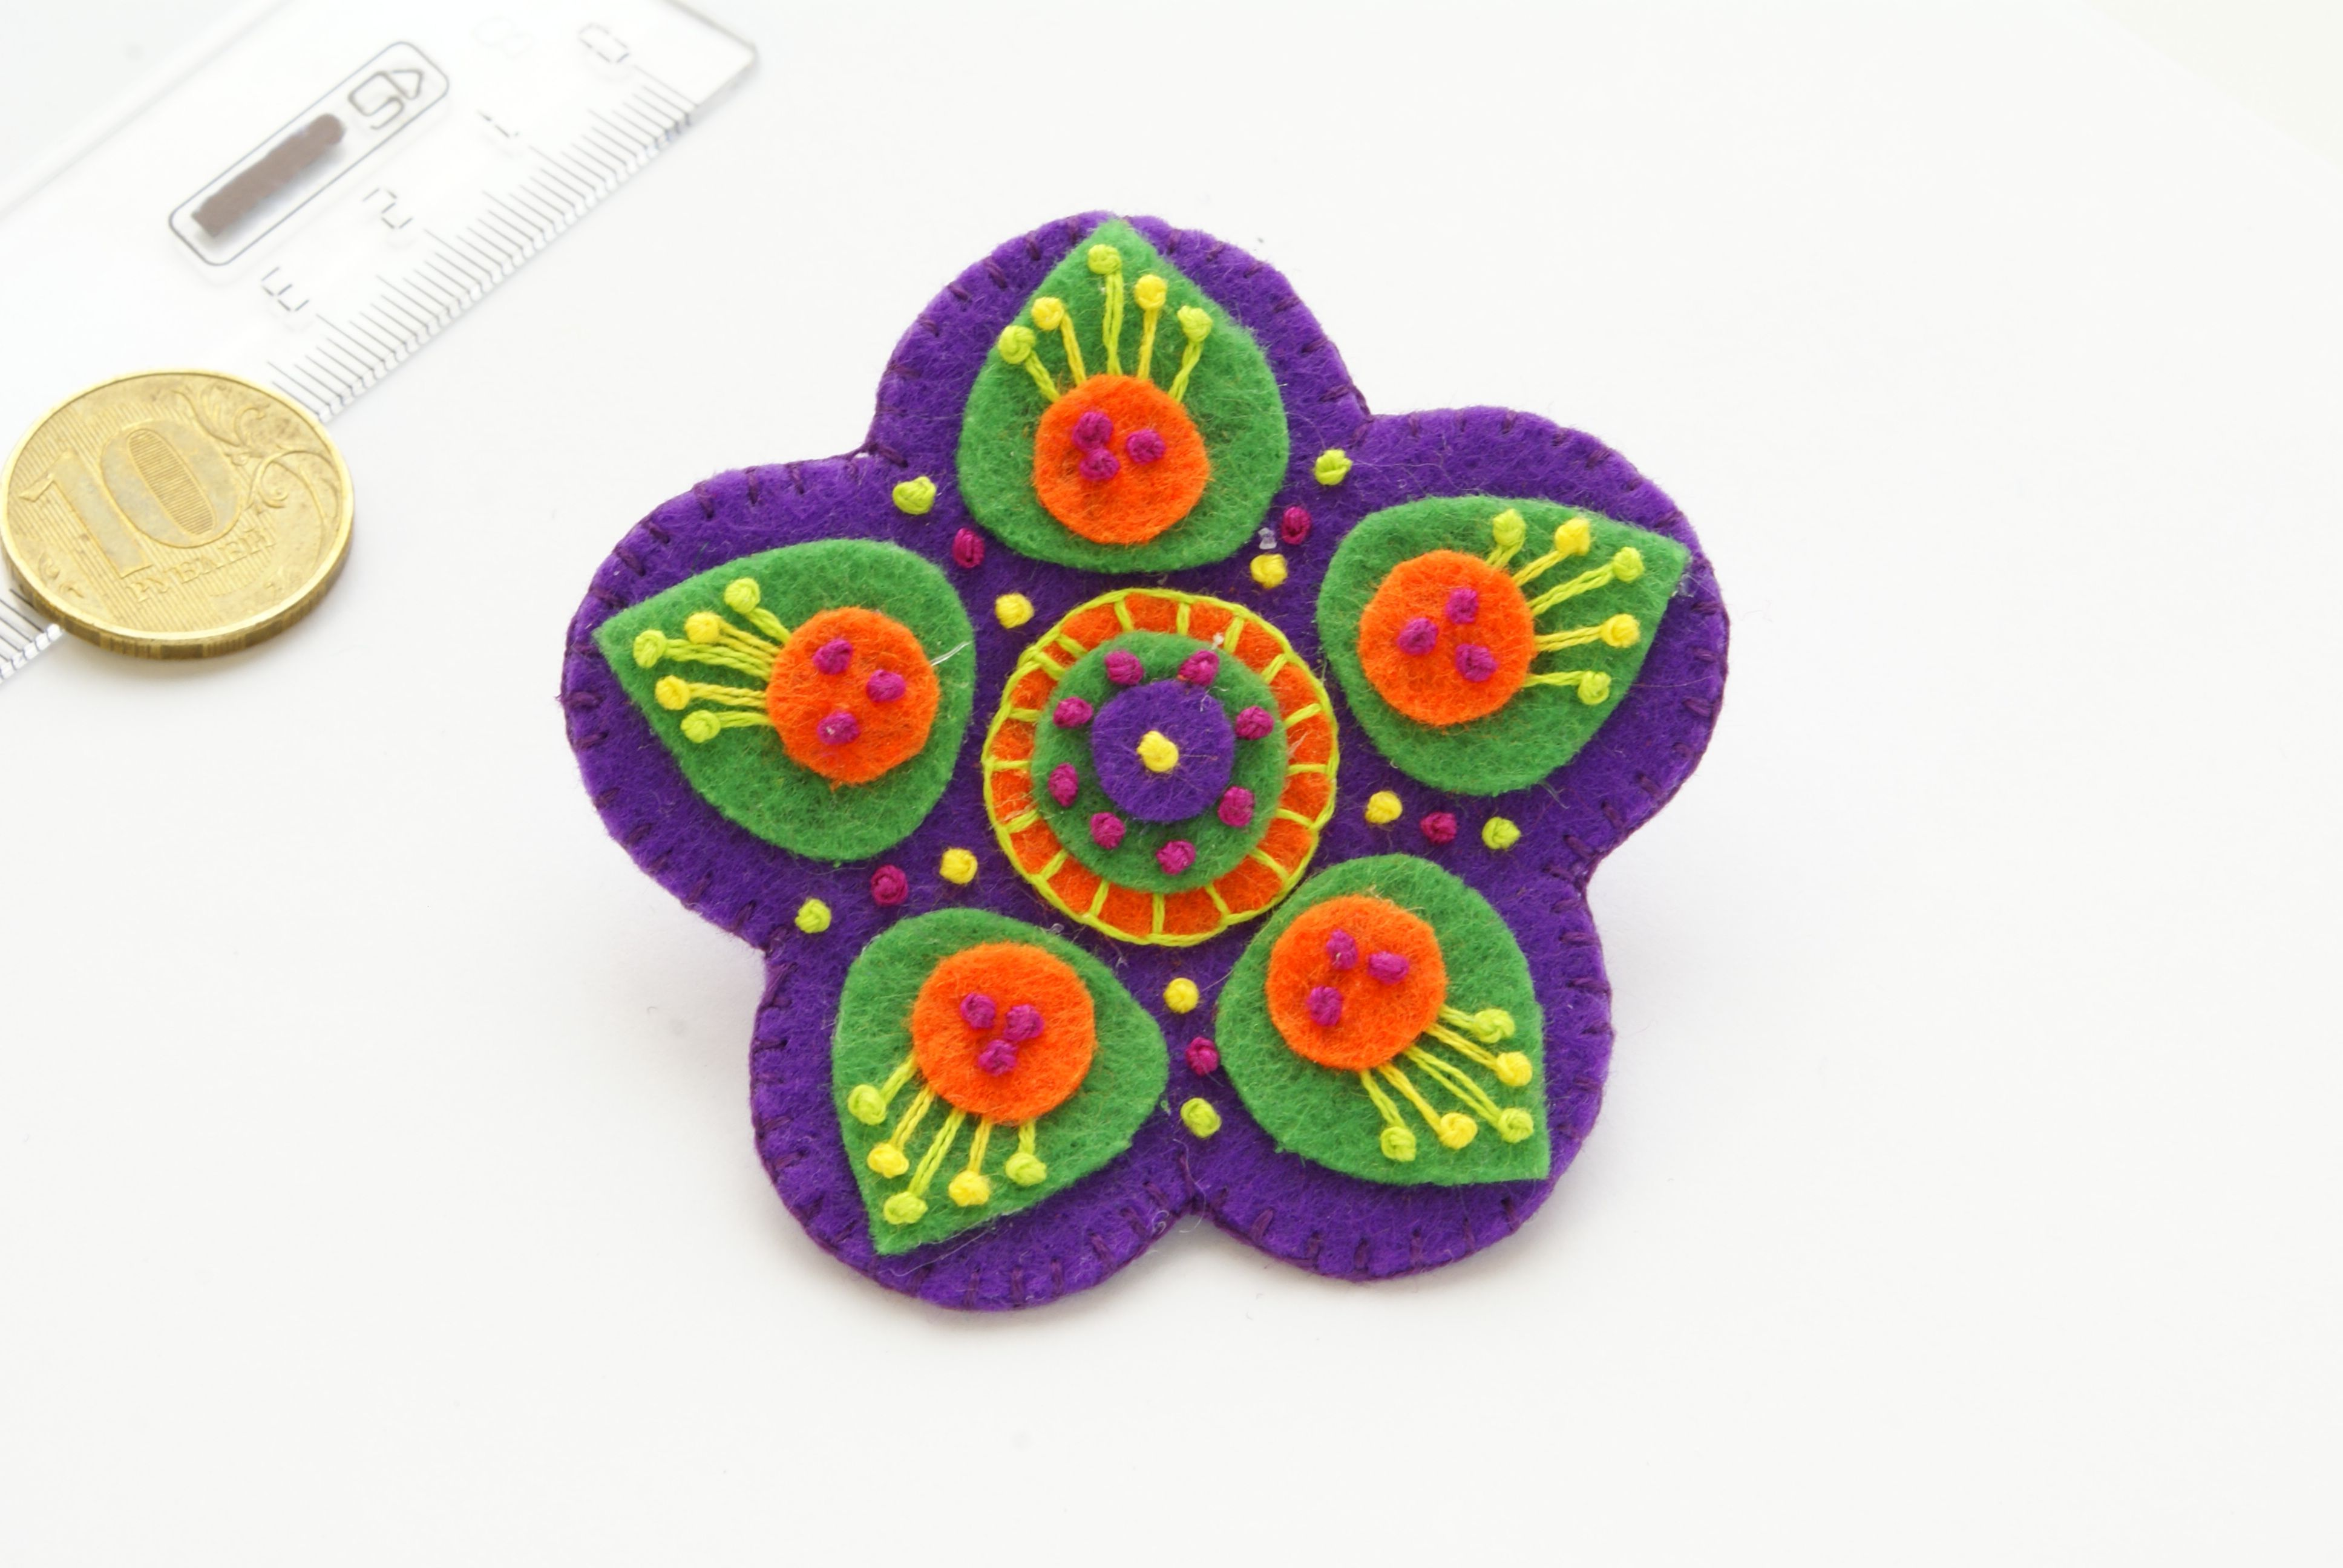 цветок брошка брошь украшение ручнаяработа фетр